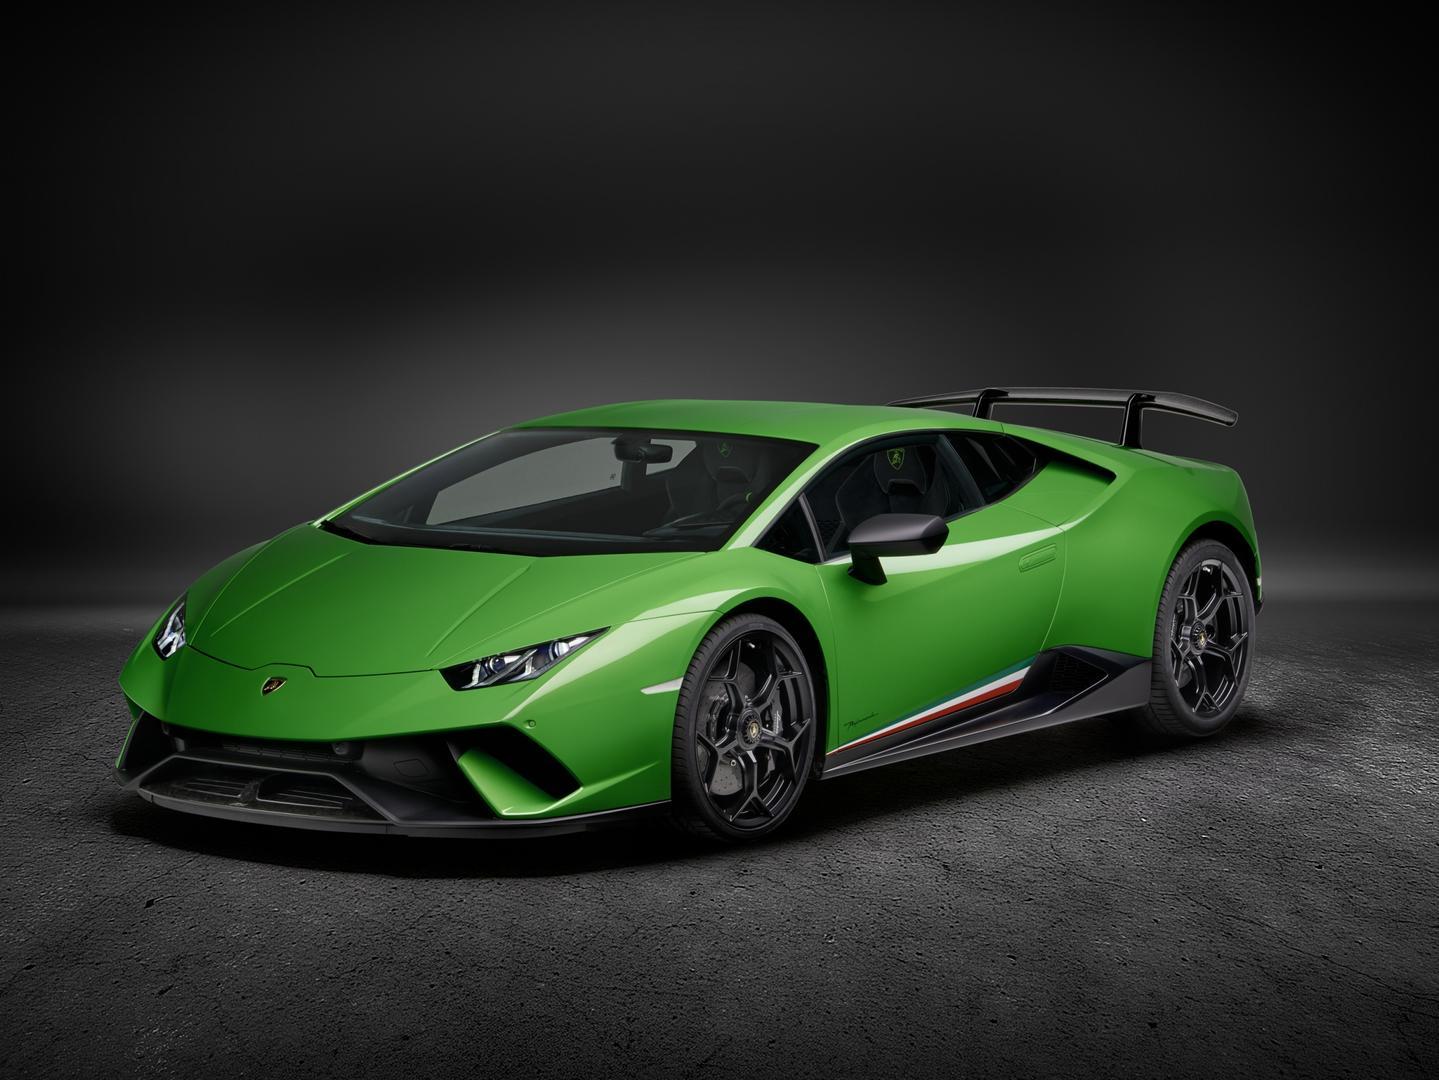 The Lamborghini Huracan Performante. Photo: Supplied.